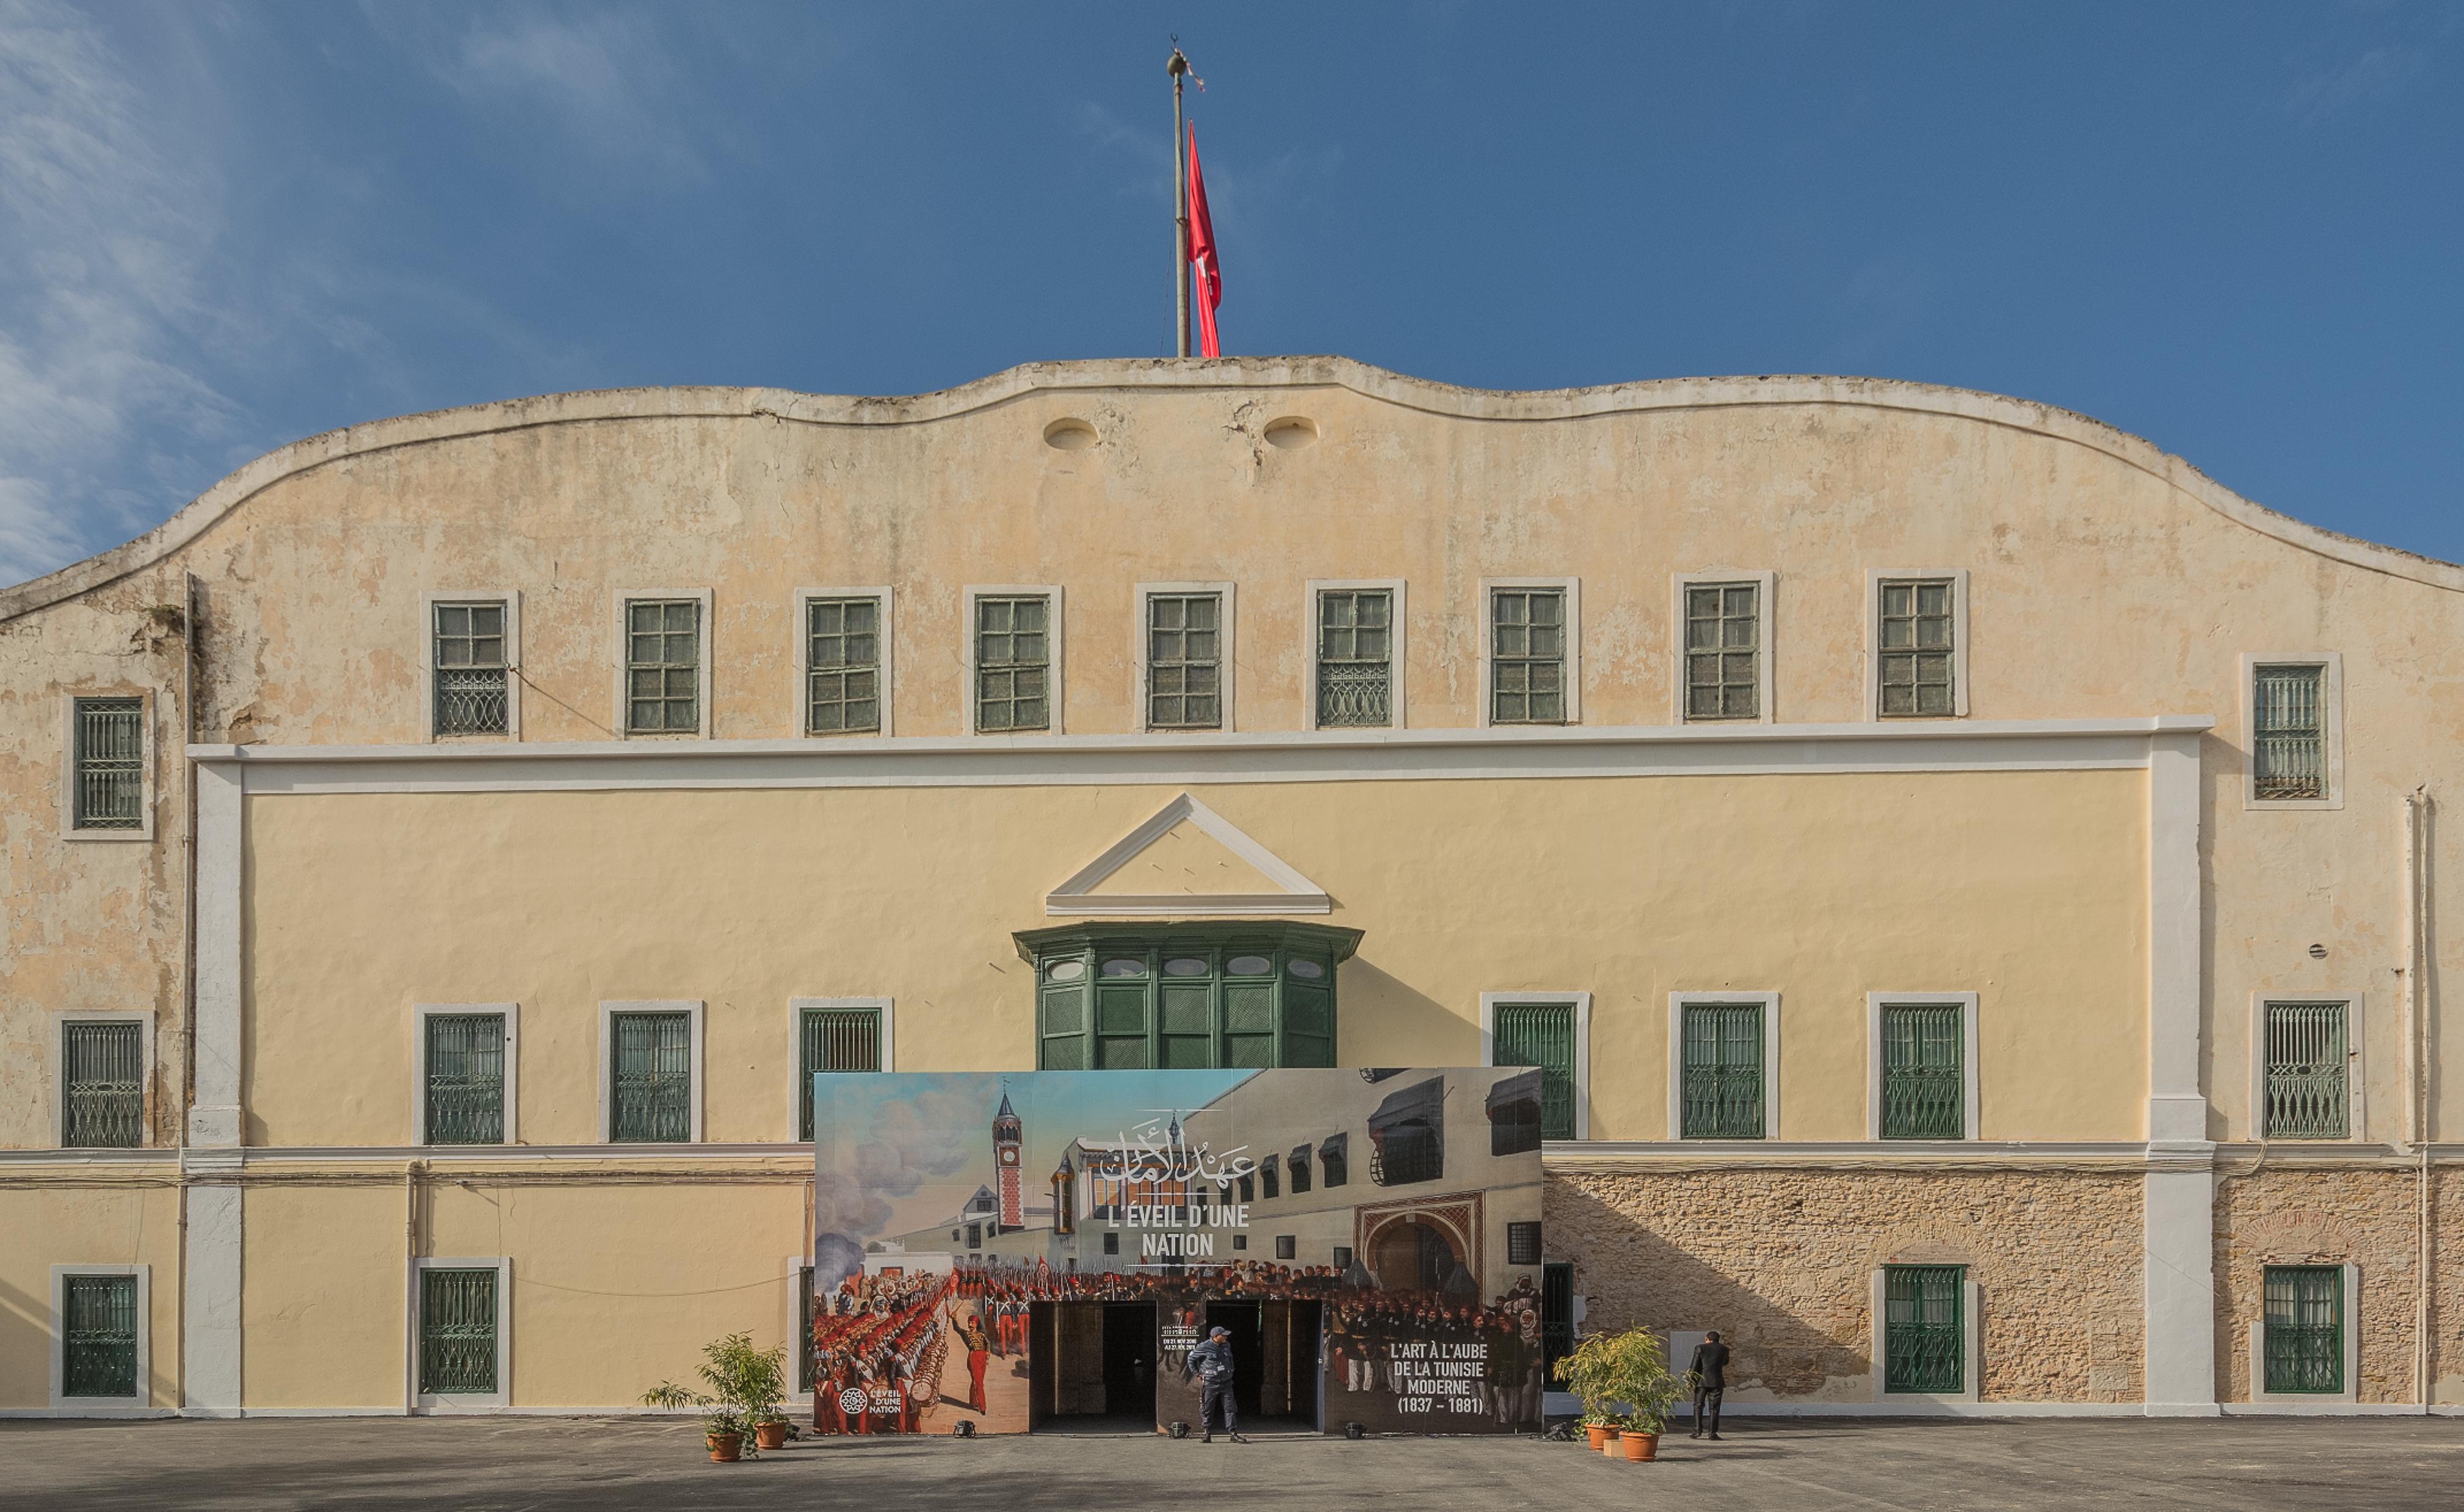 Fabrication D Escalier En Tunisie palais de ksar saïd — wikipédia